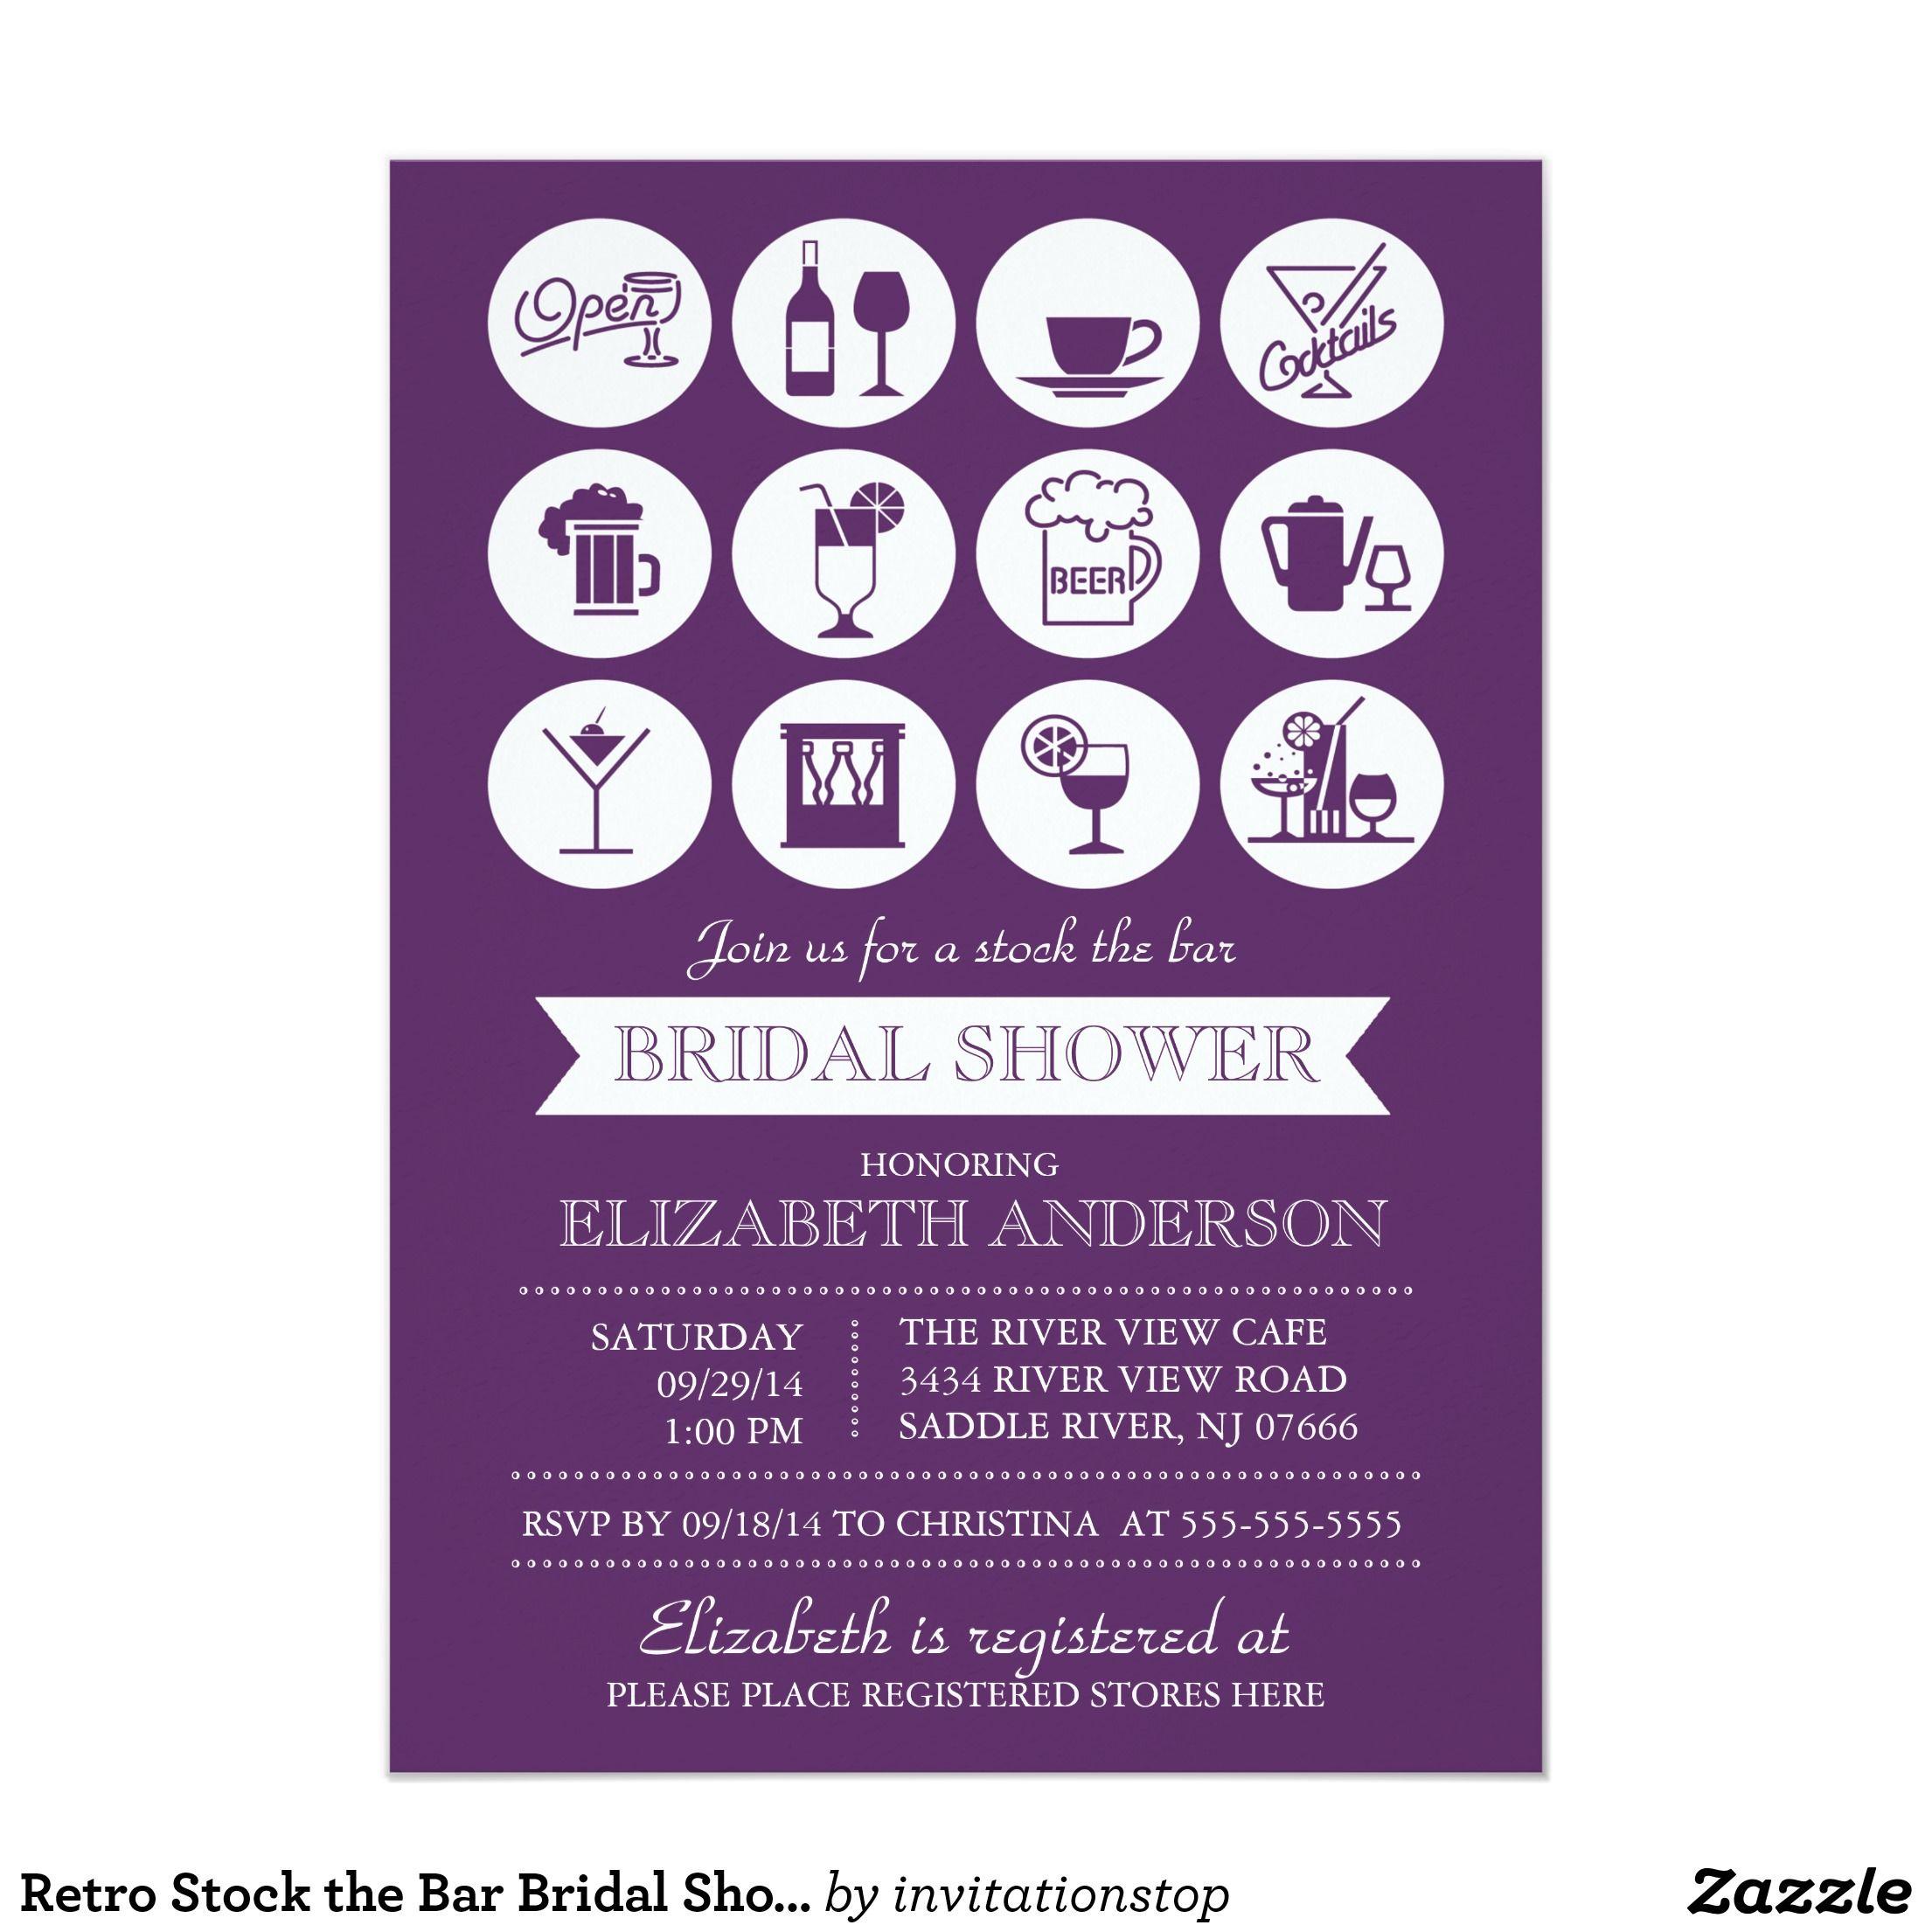 Retro Stock the Bar Bridal Shower Invitation | Shower invitations ...